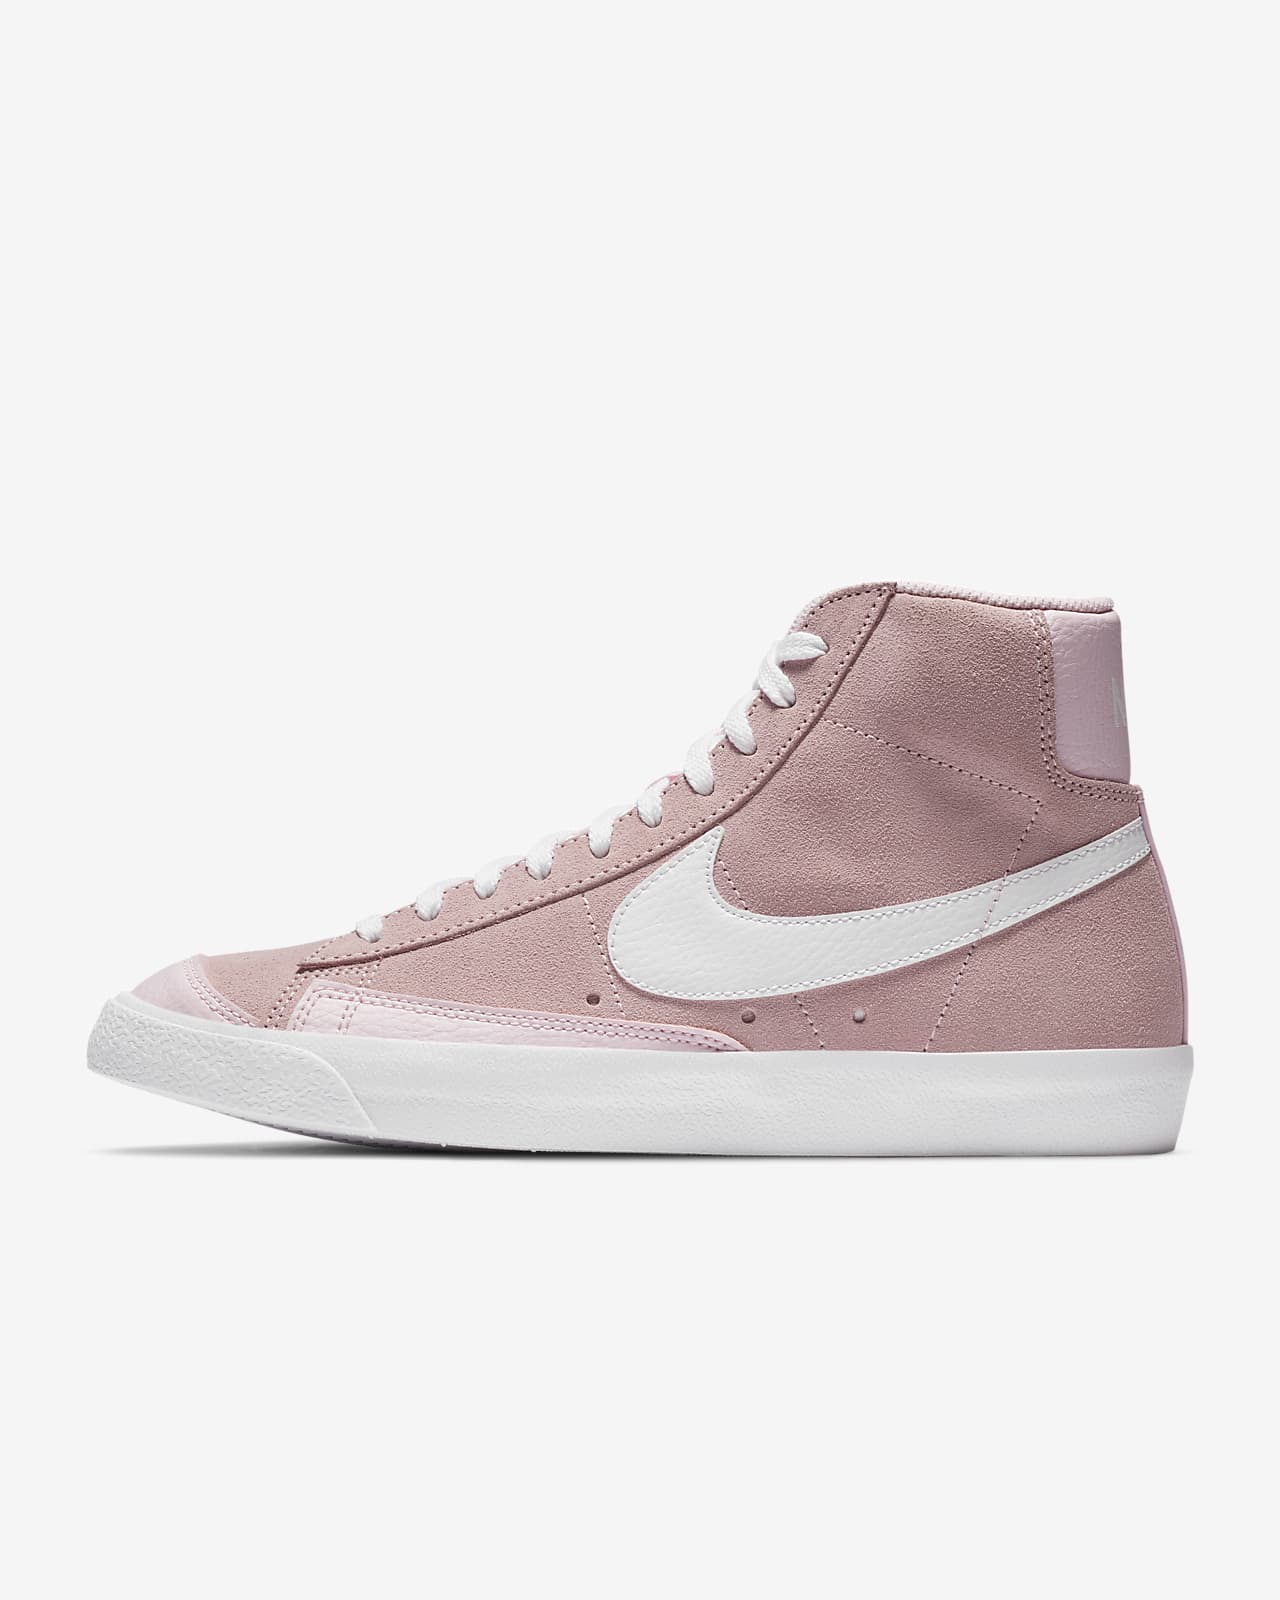 Calzado para mujer Nike Blazer Mid Vintage '77